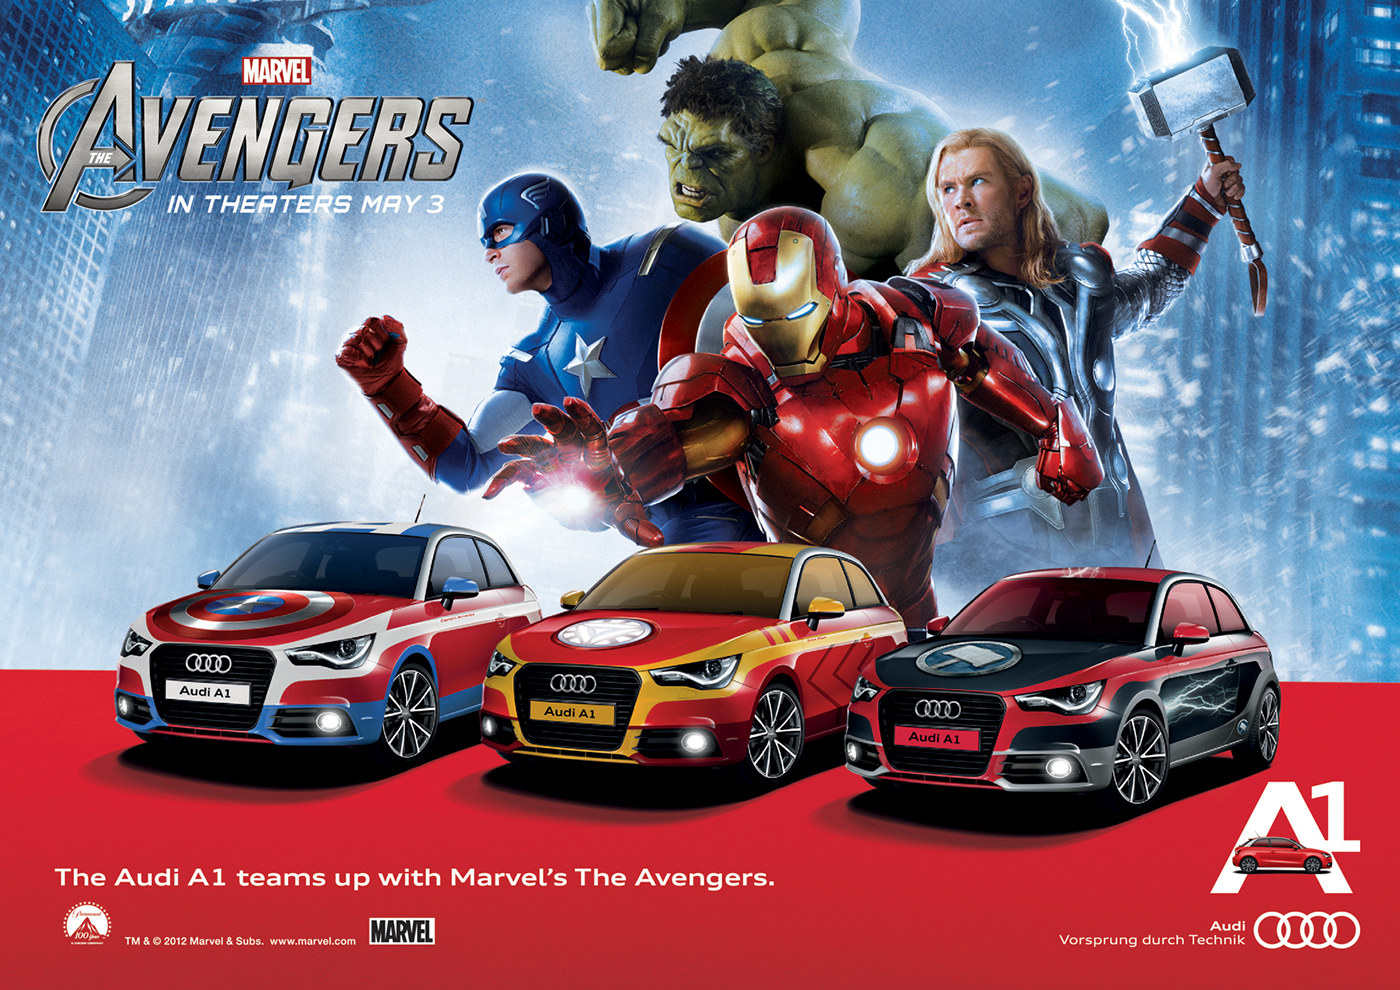 Audi A1 Avengers Activation Stunt On Behance